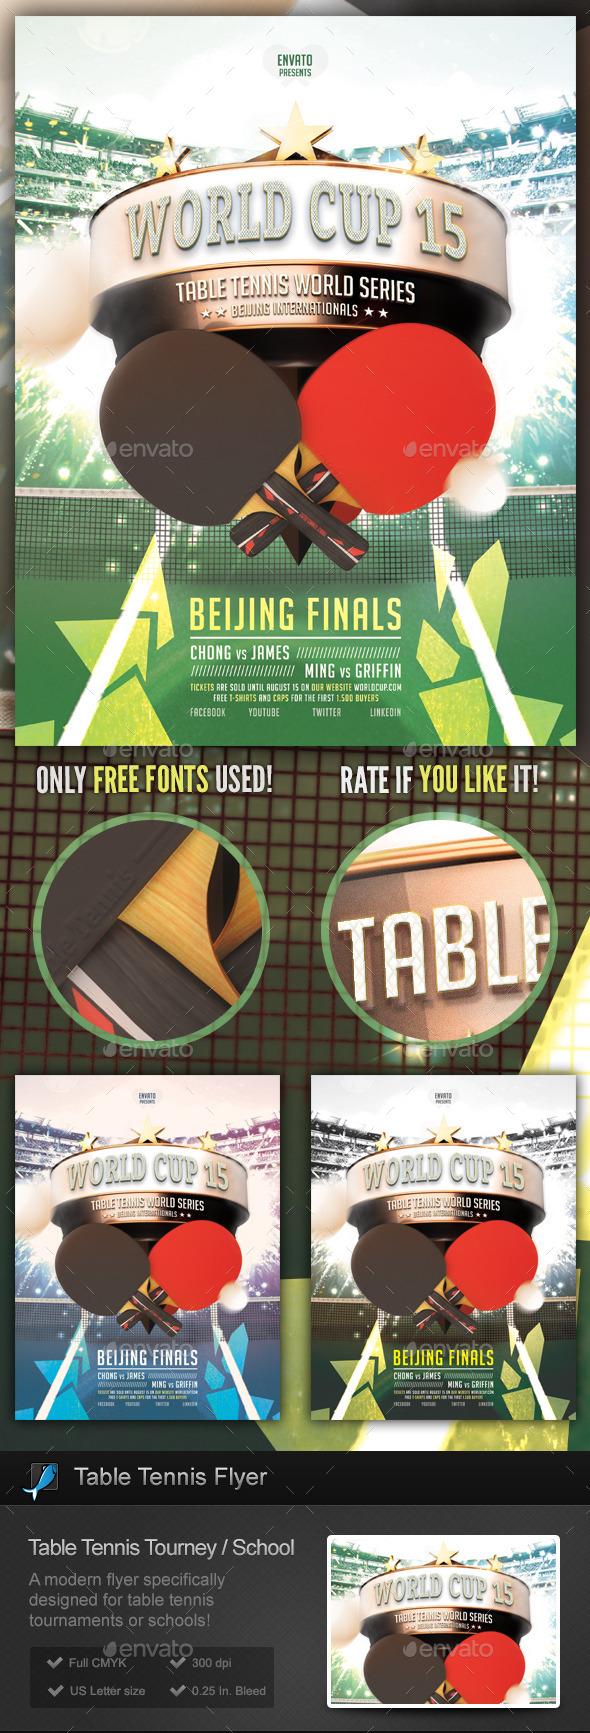 Table Tennis Tournament / School Flyer - Sports Events